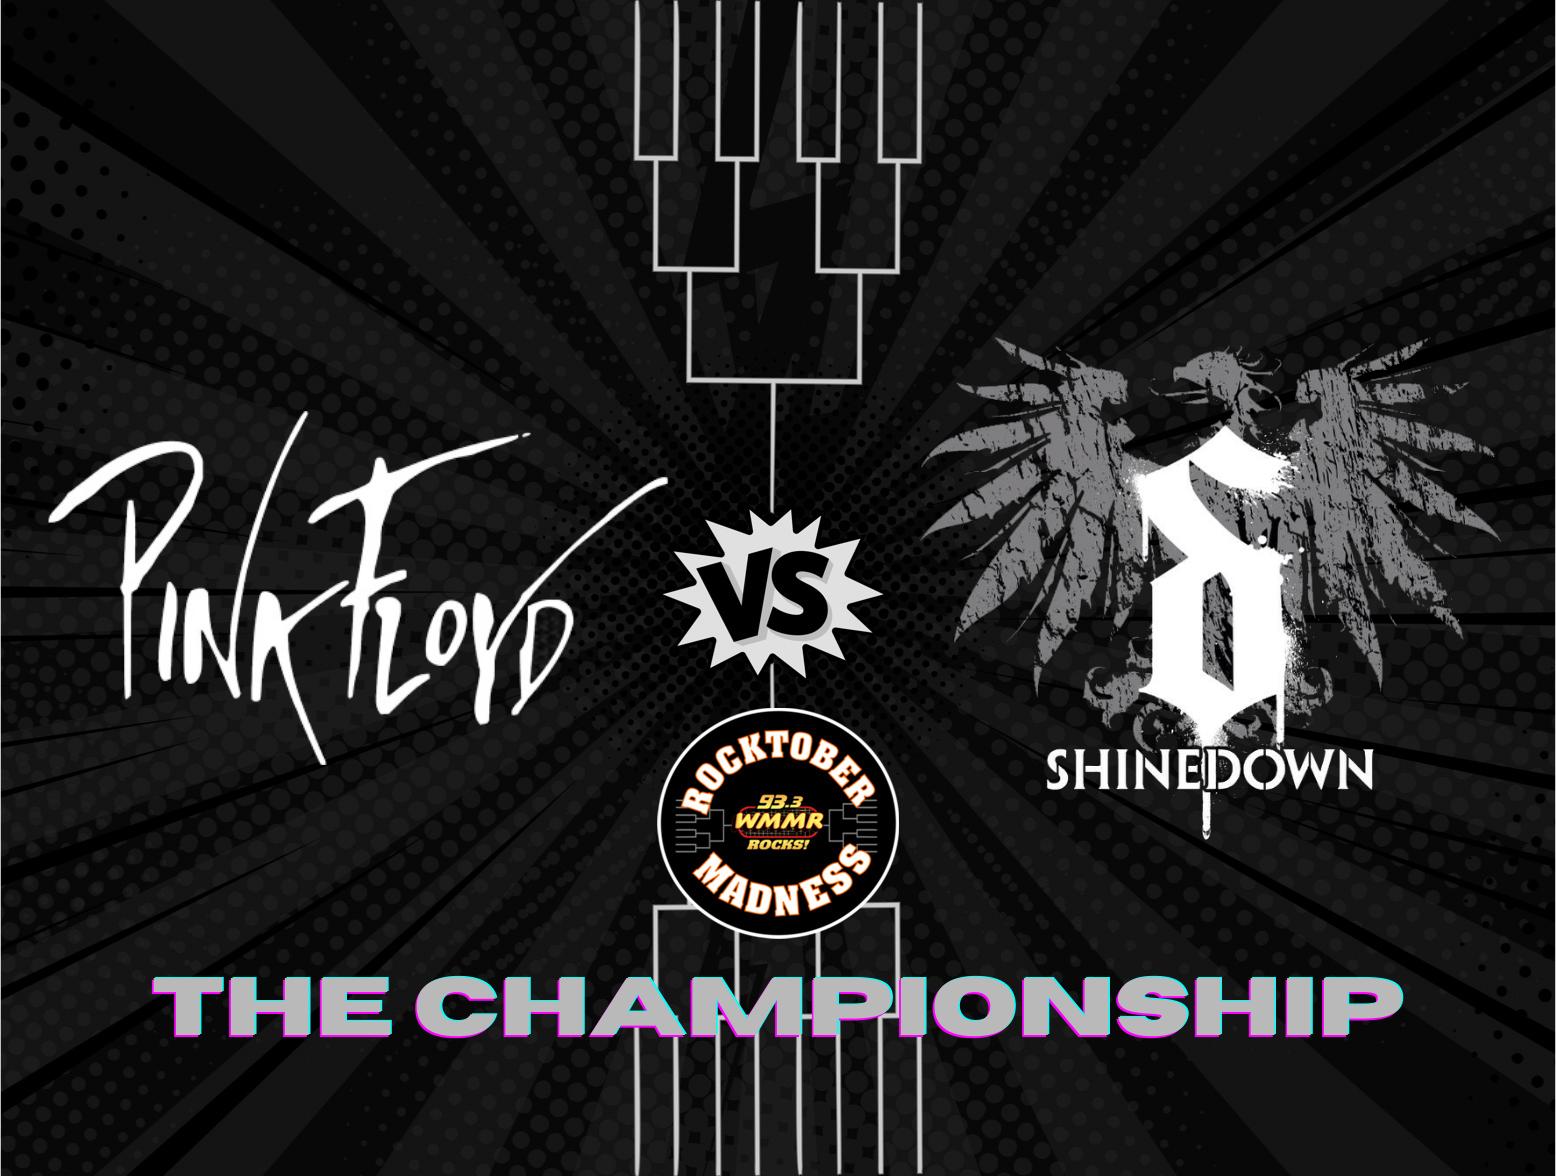 MMR Rocktober Madness Round 6 The Championship Pink Floyd vs Shinedown